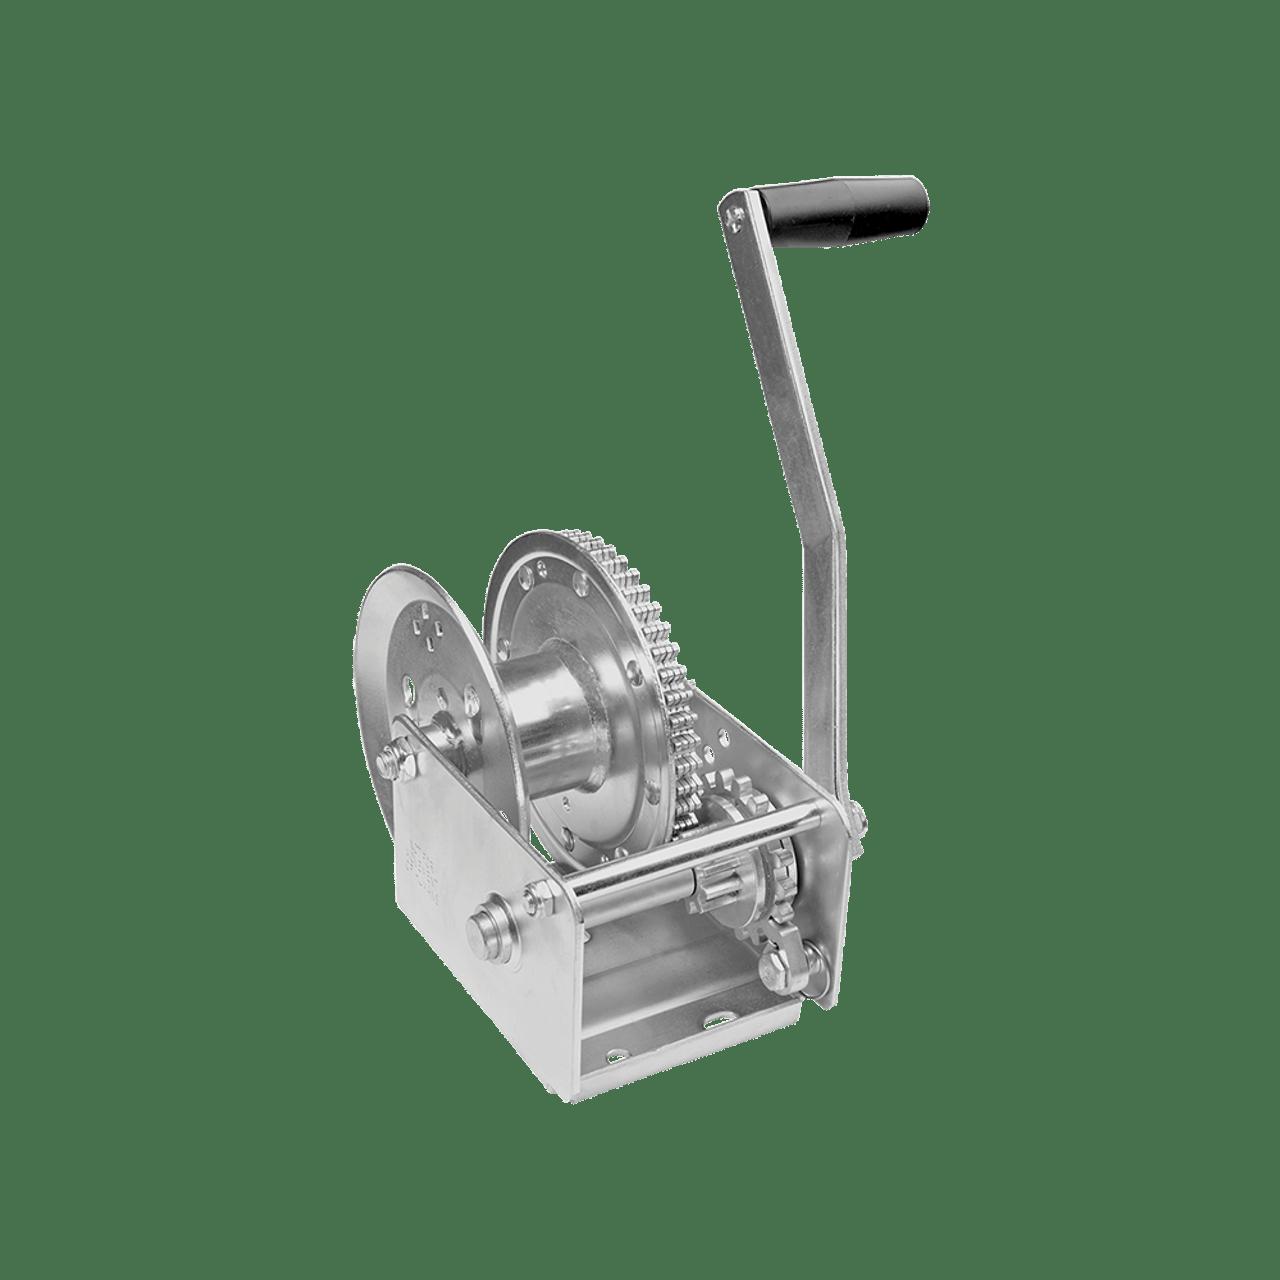 medium resolution of fulton boat trailer wiring diagram wiring diagram gp143100 fulton single speed winch with automatic brake 1 500